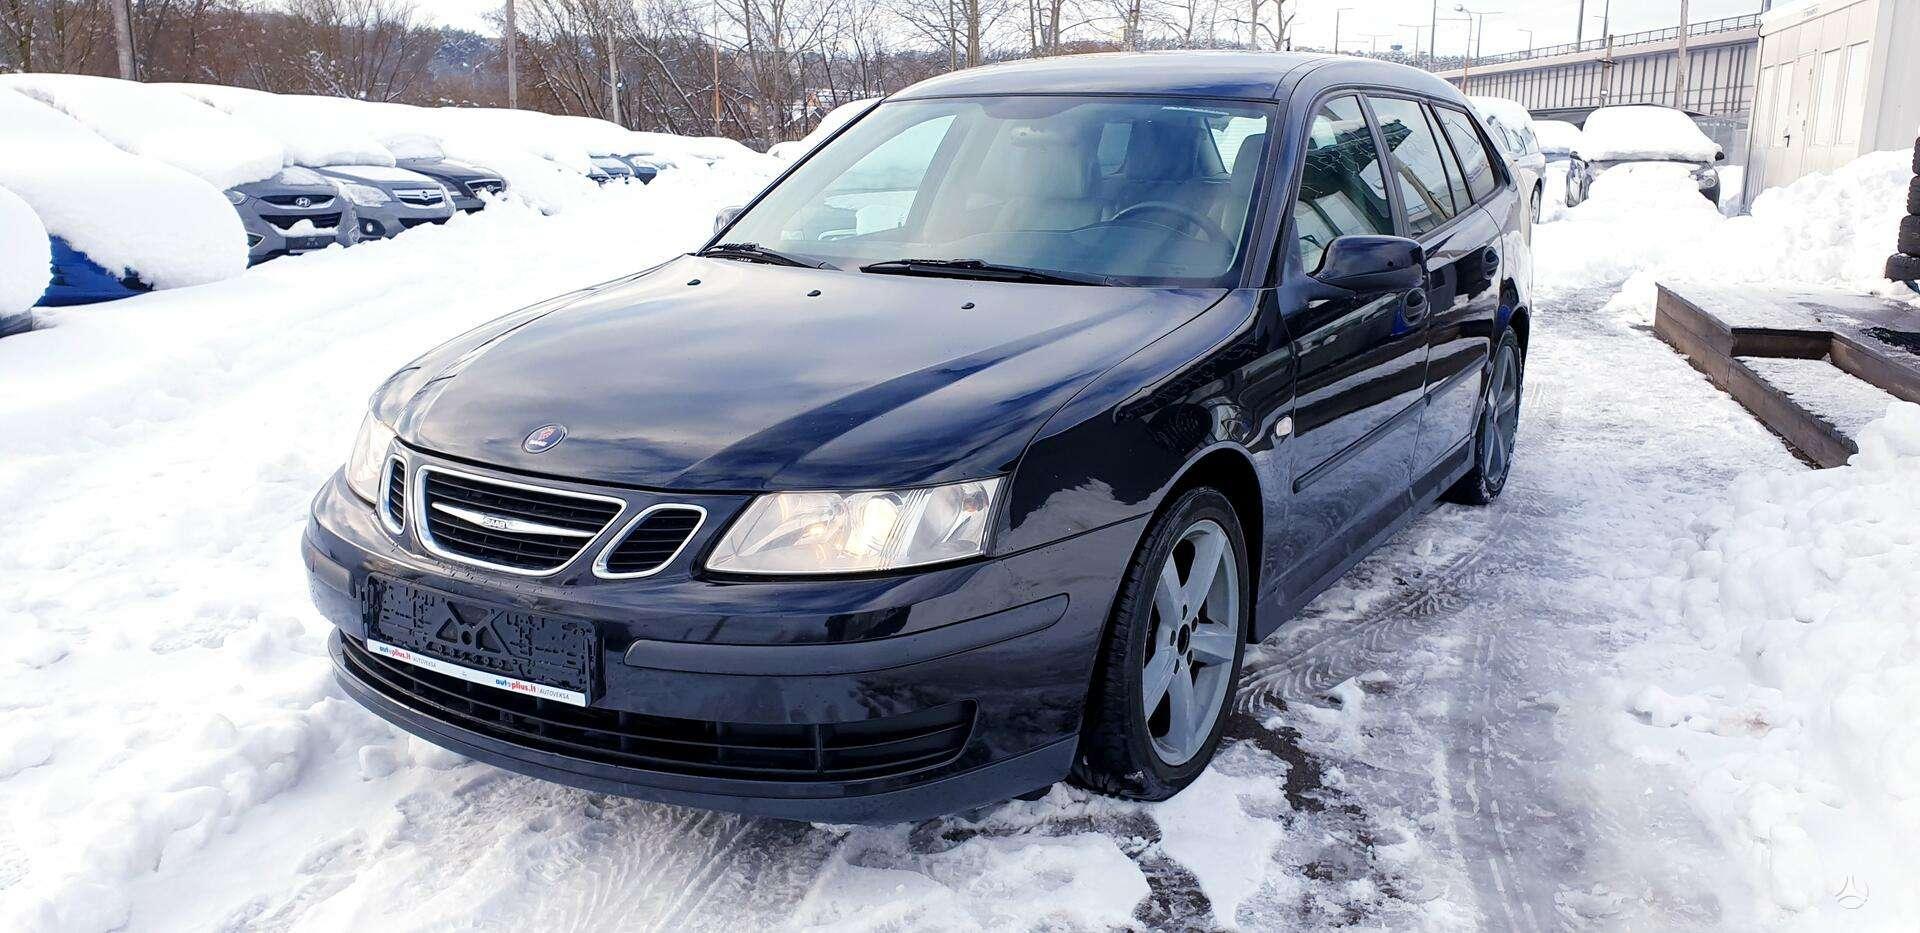 Saab 9-3 ✅ 2008 m. ✅1.9 (88kW) Dyzelinas✅